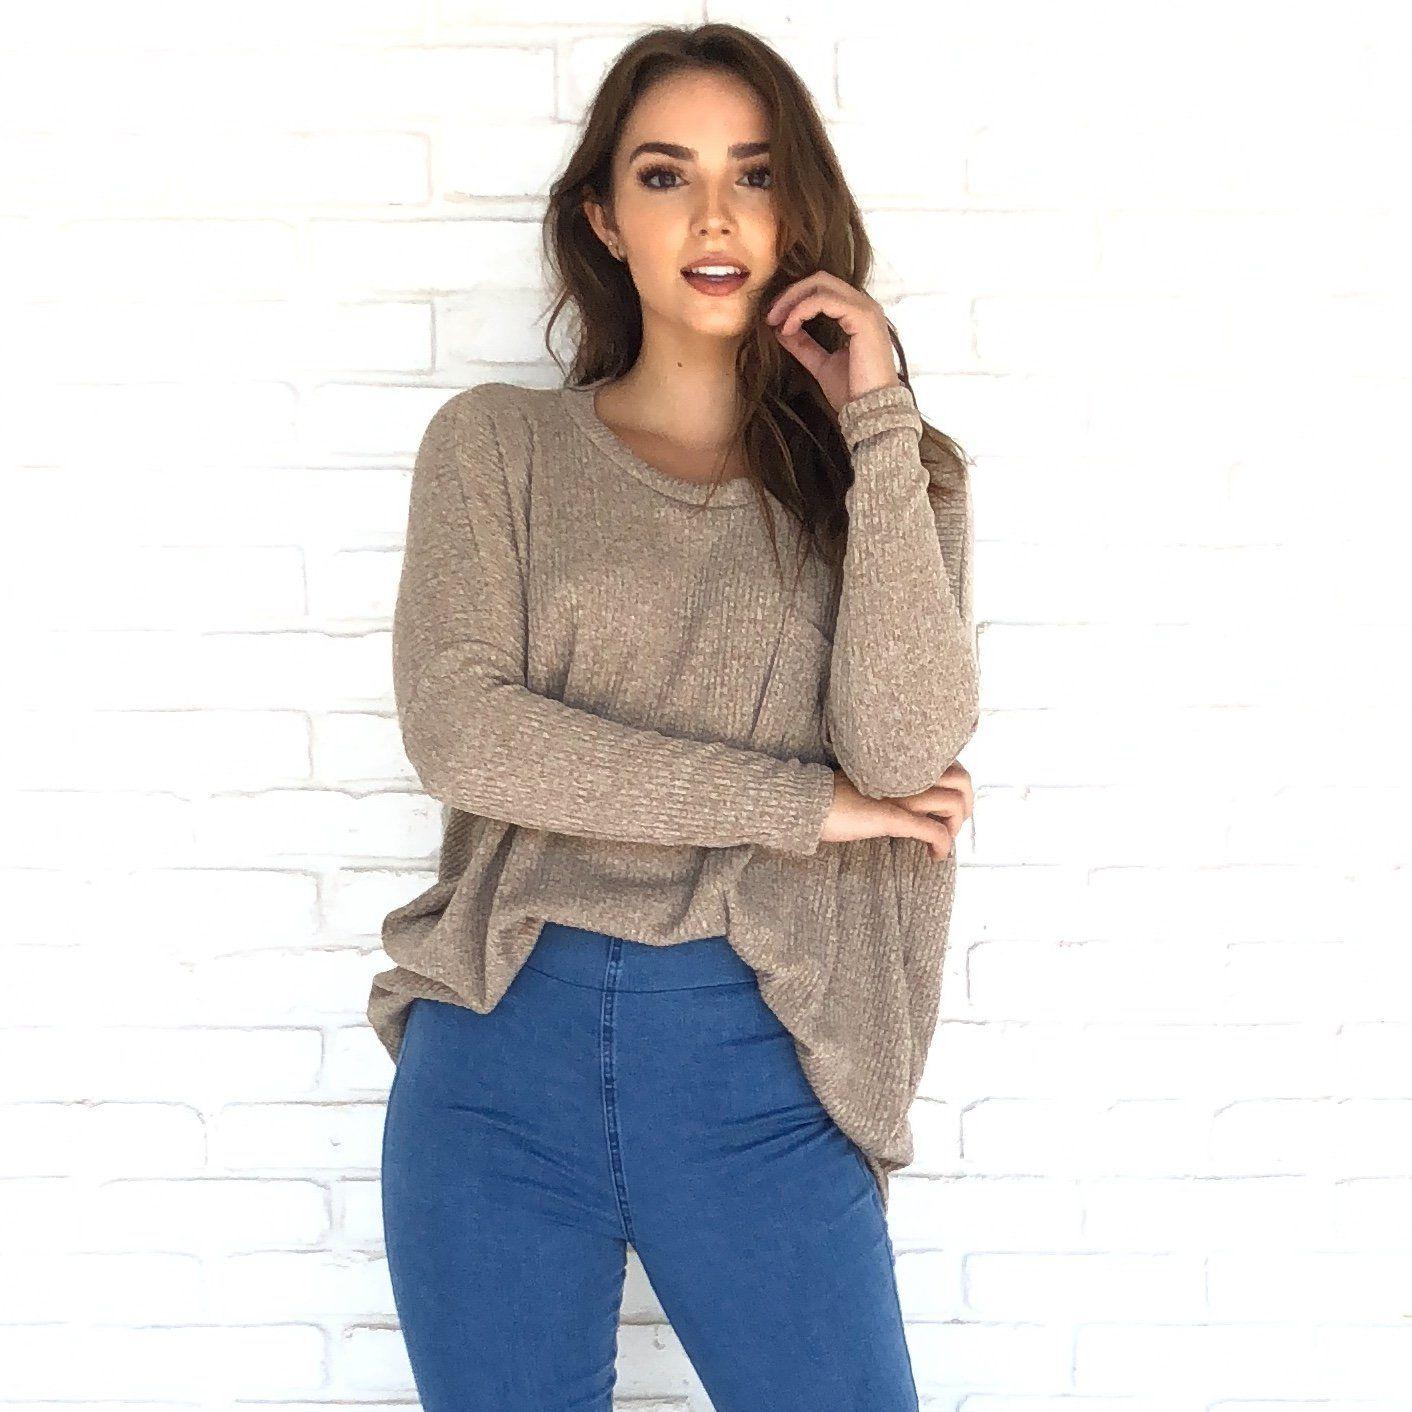 9bfa9a30f0 Karat Pocket Knit Sweater Top - Dainty Hooligan Boutique